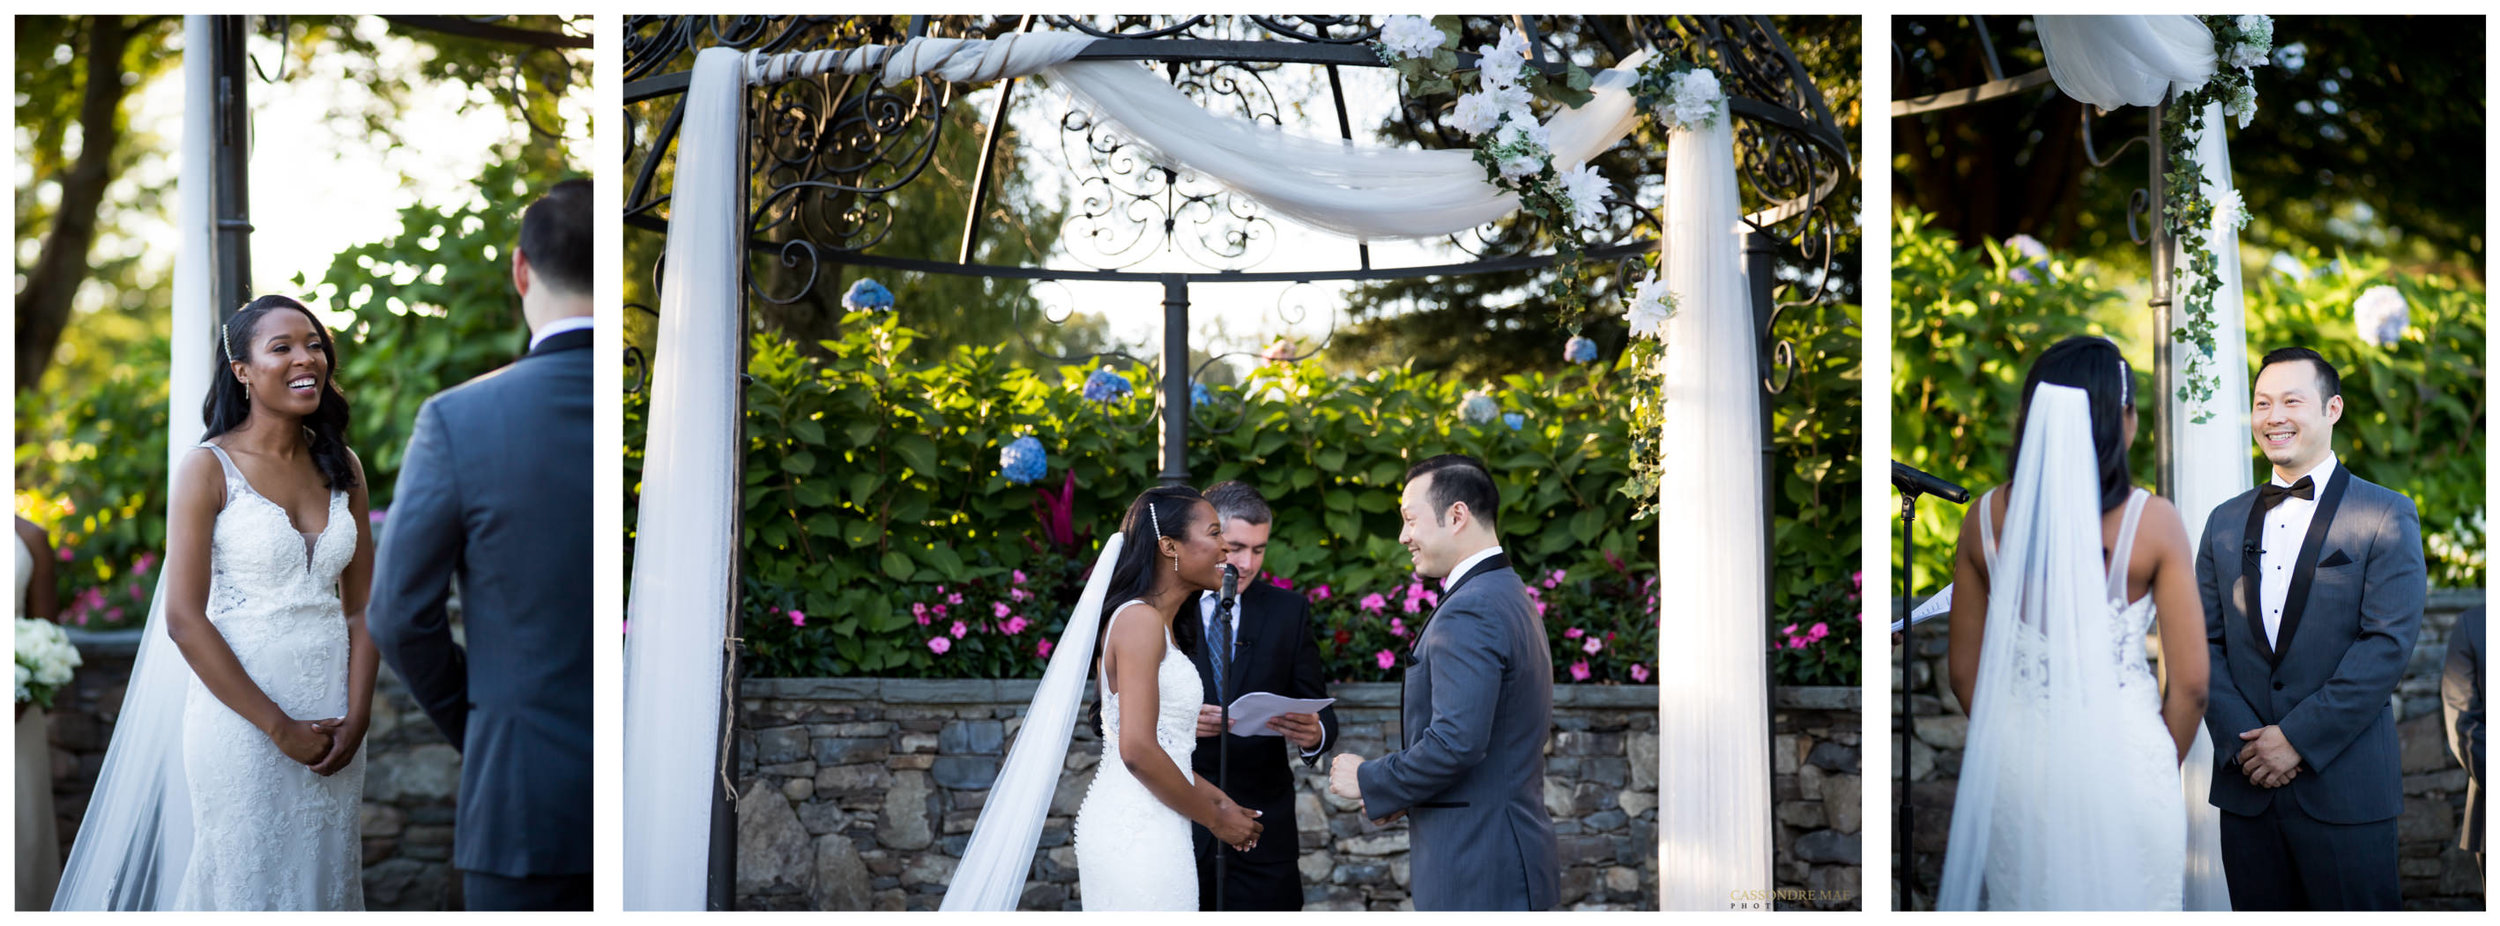 West Hills Country Club Wedding Photos Cassondre Mae Photography 9.jpg